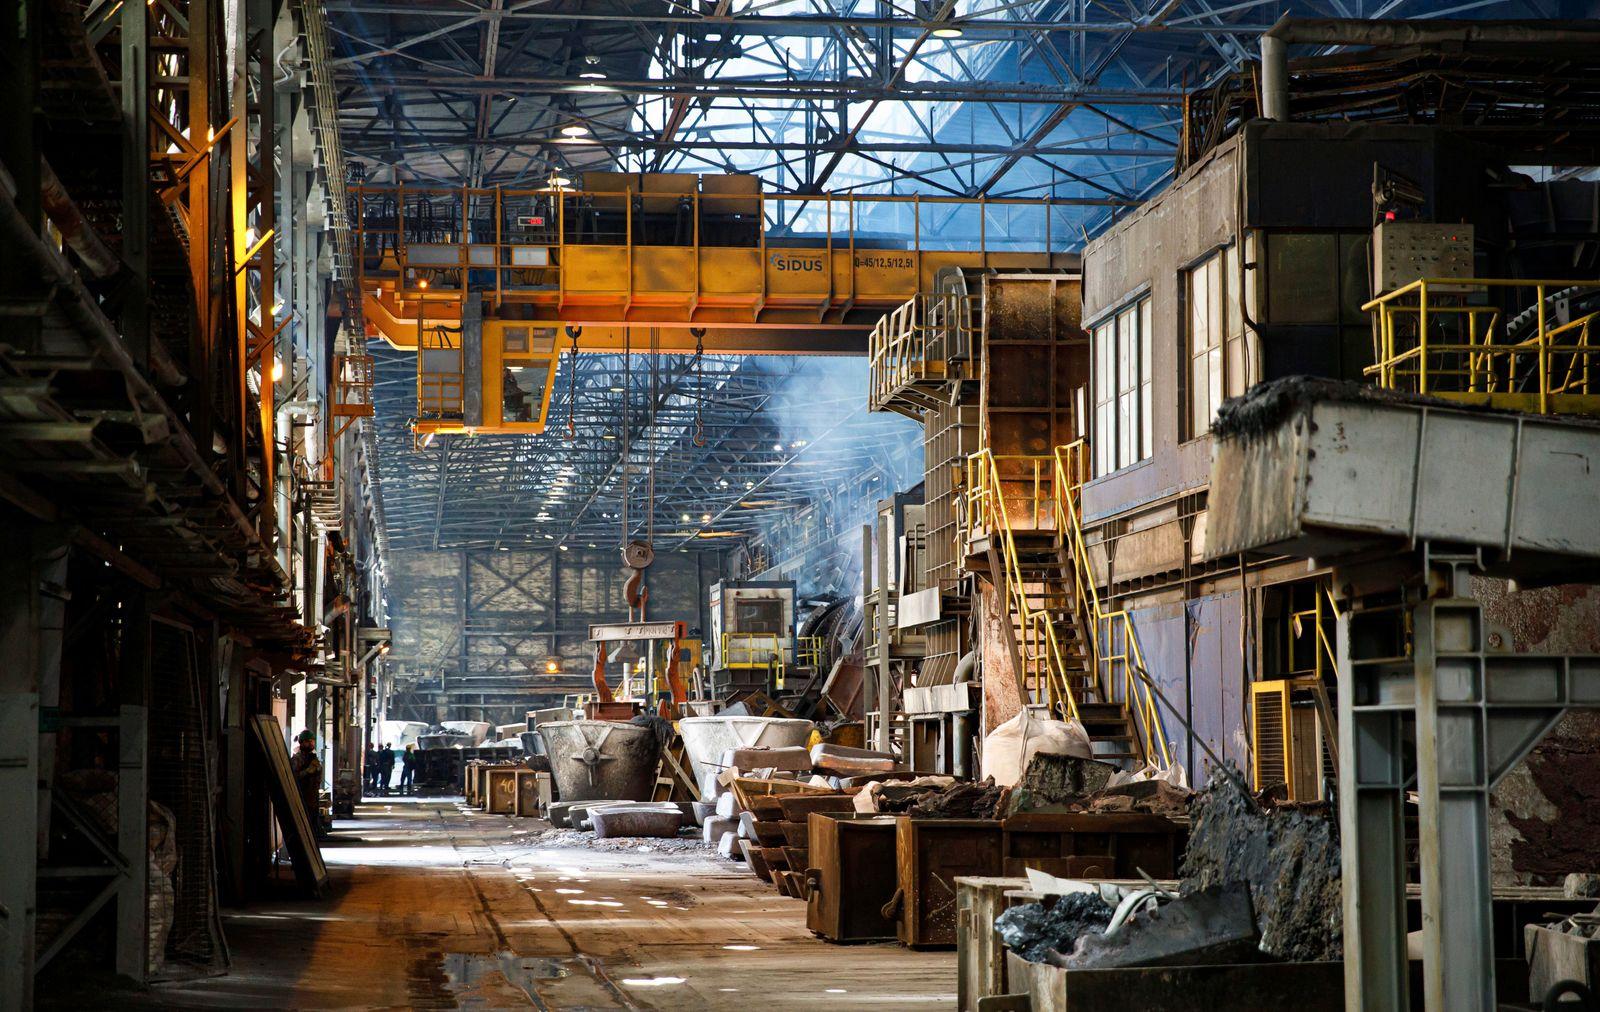 Steel mill Legica that belongs to one of the biggest